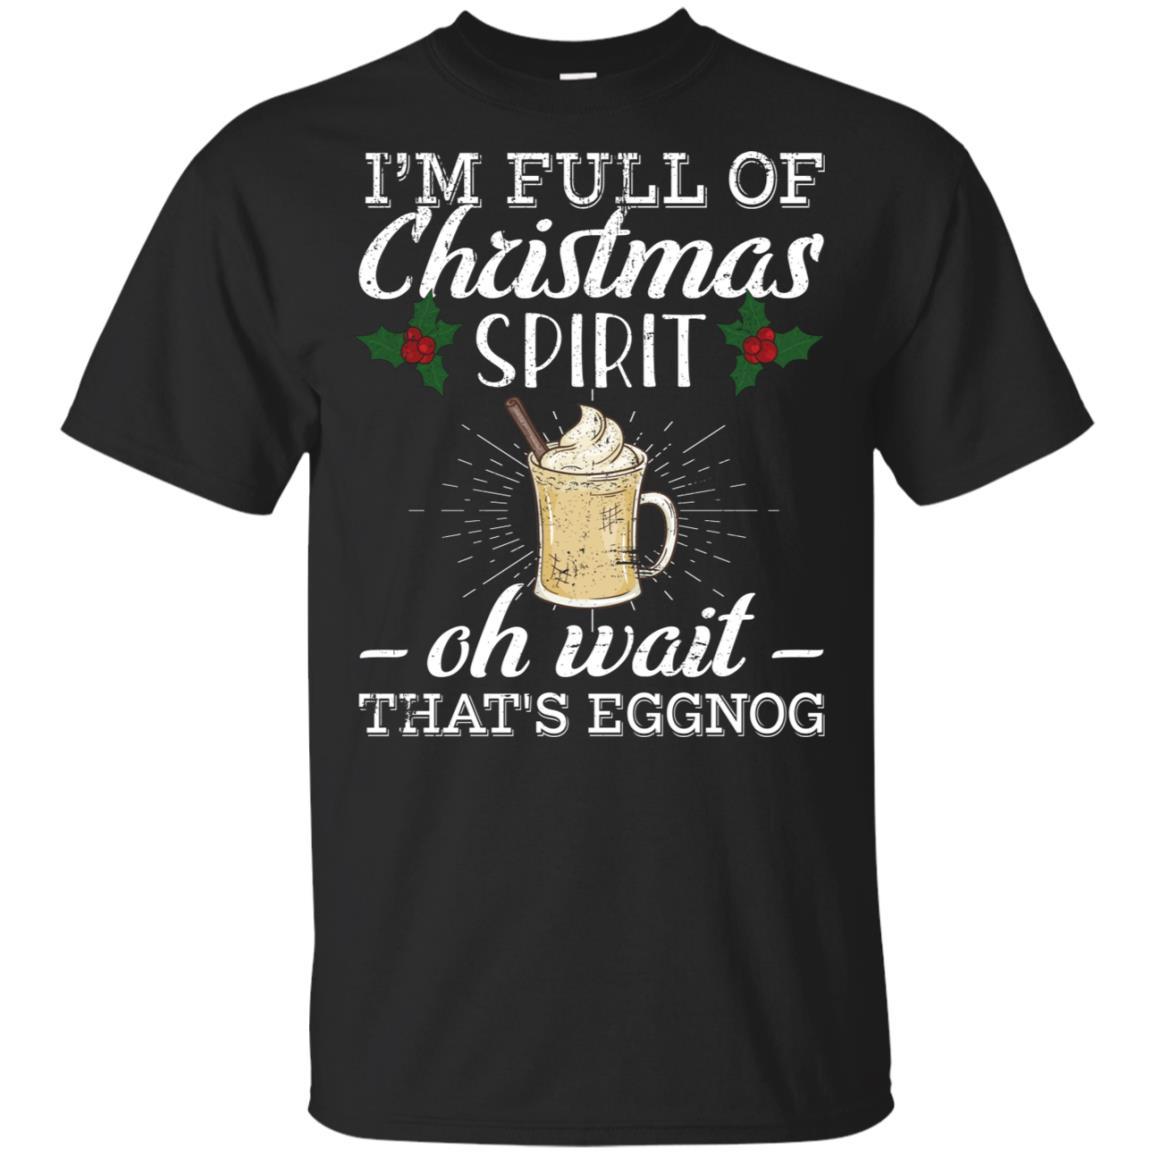 I'm Full of Christmas Spirit Oh Wait That's Eggnog - -2 Unisex Short Sleeve